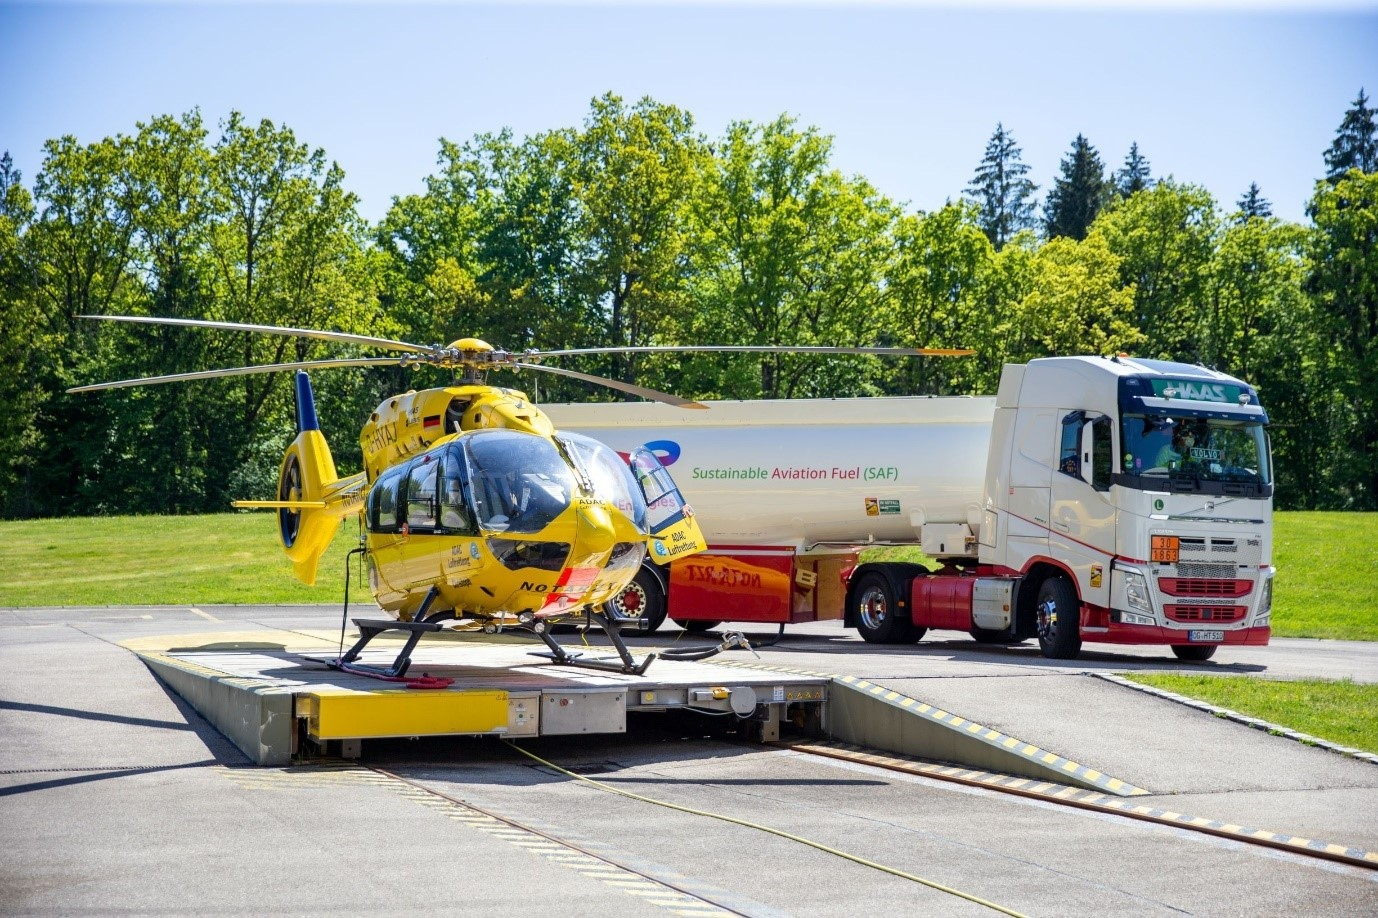 Helicóptero H145